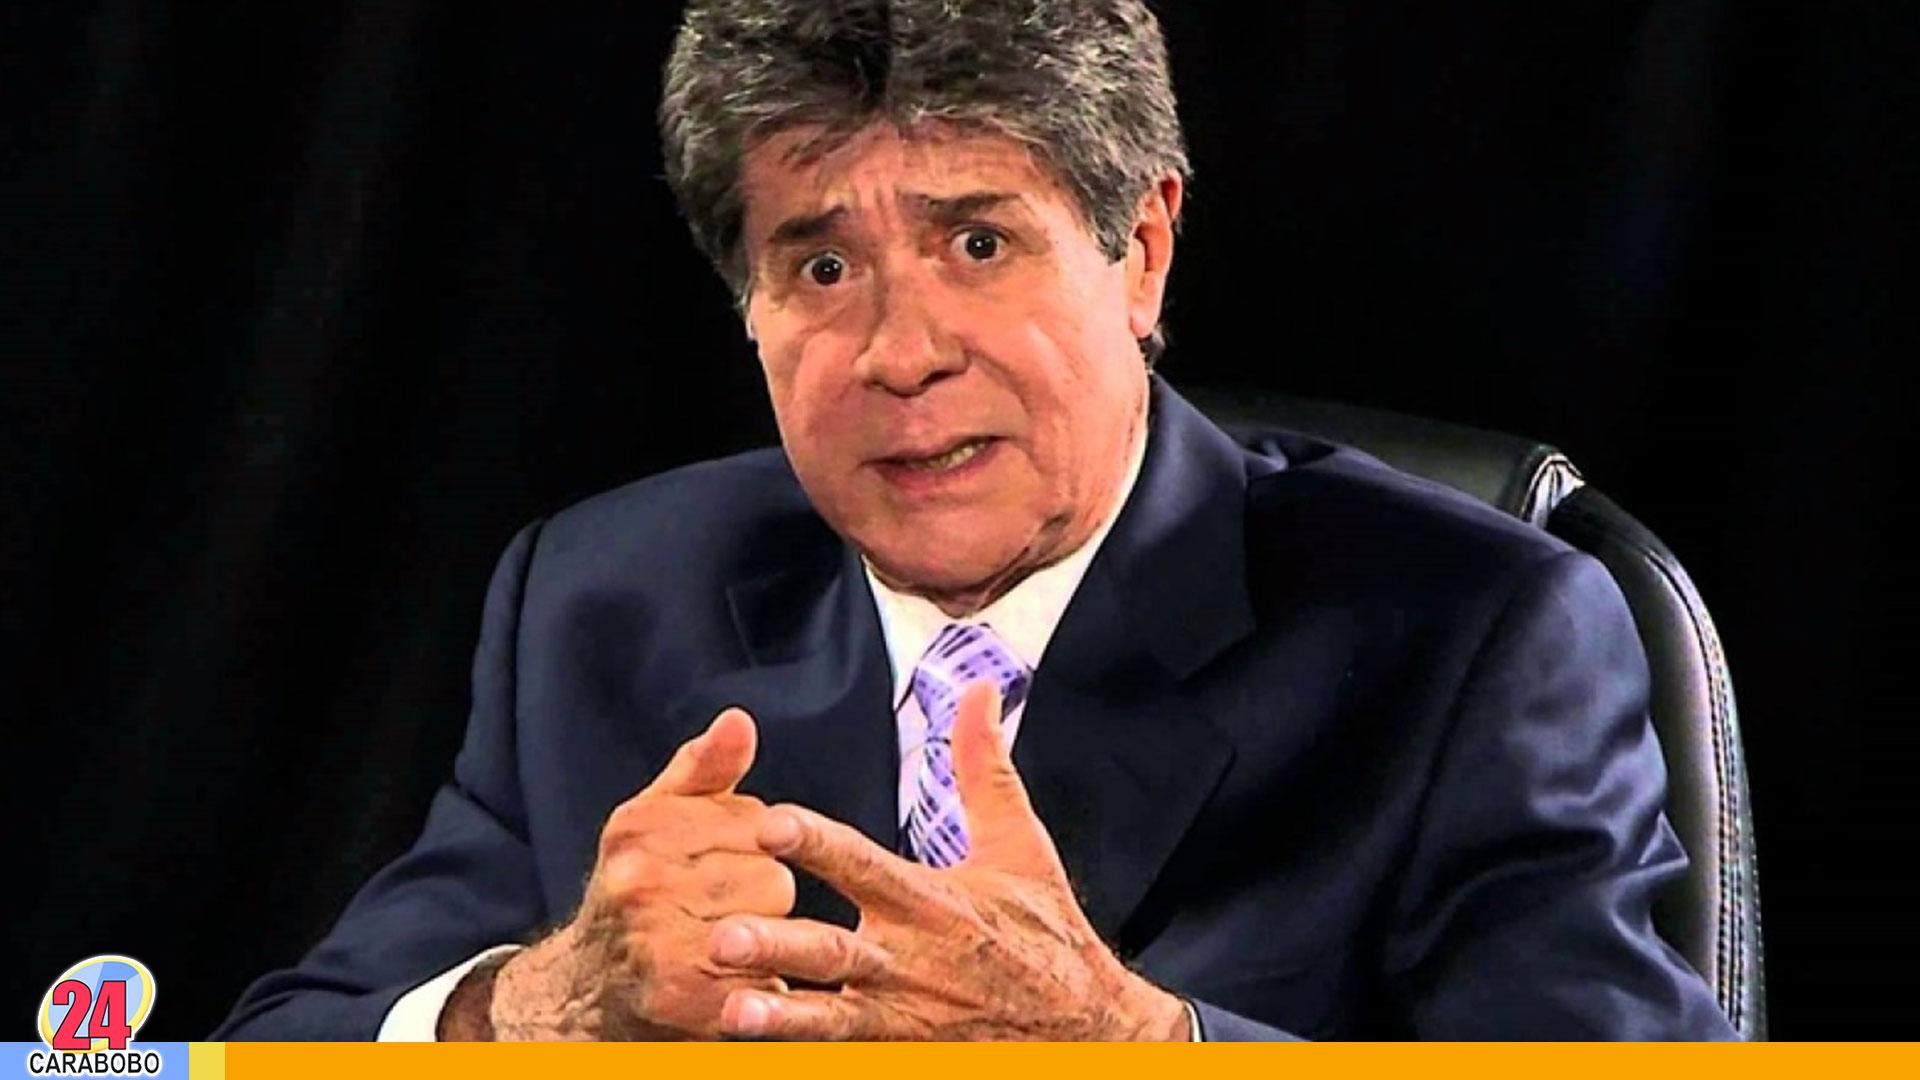 eduardo Serrano - Eduardo Serrano